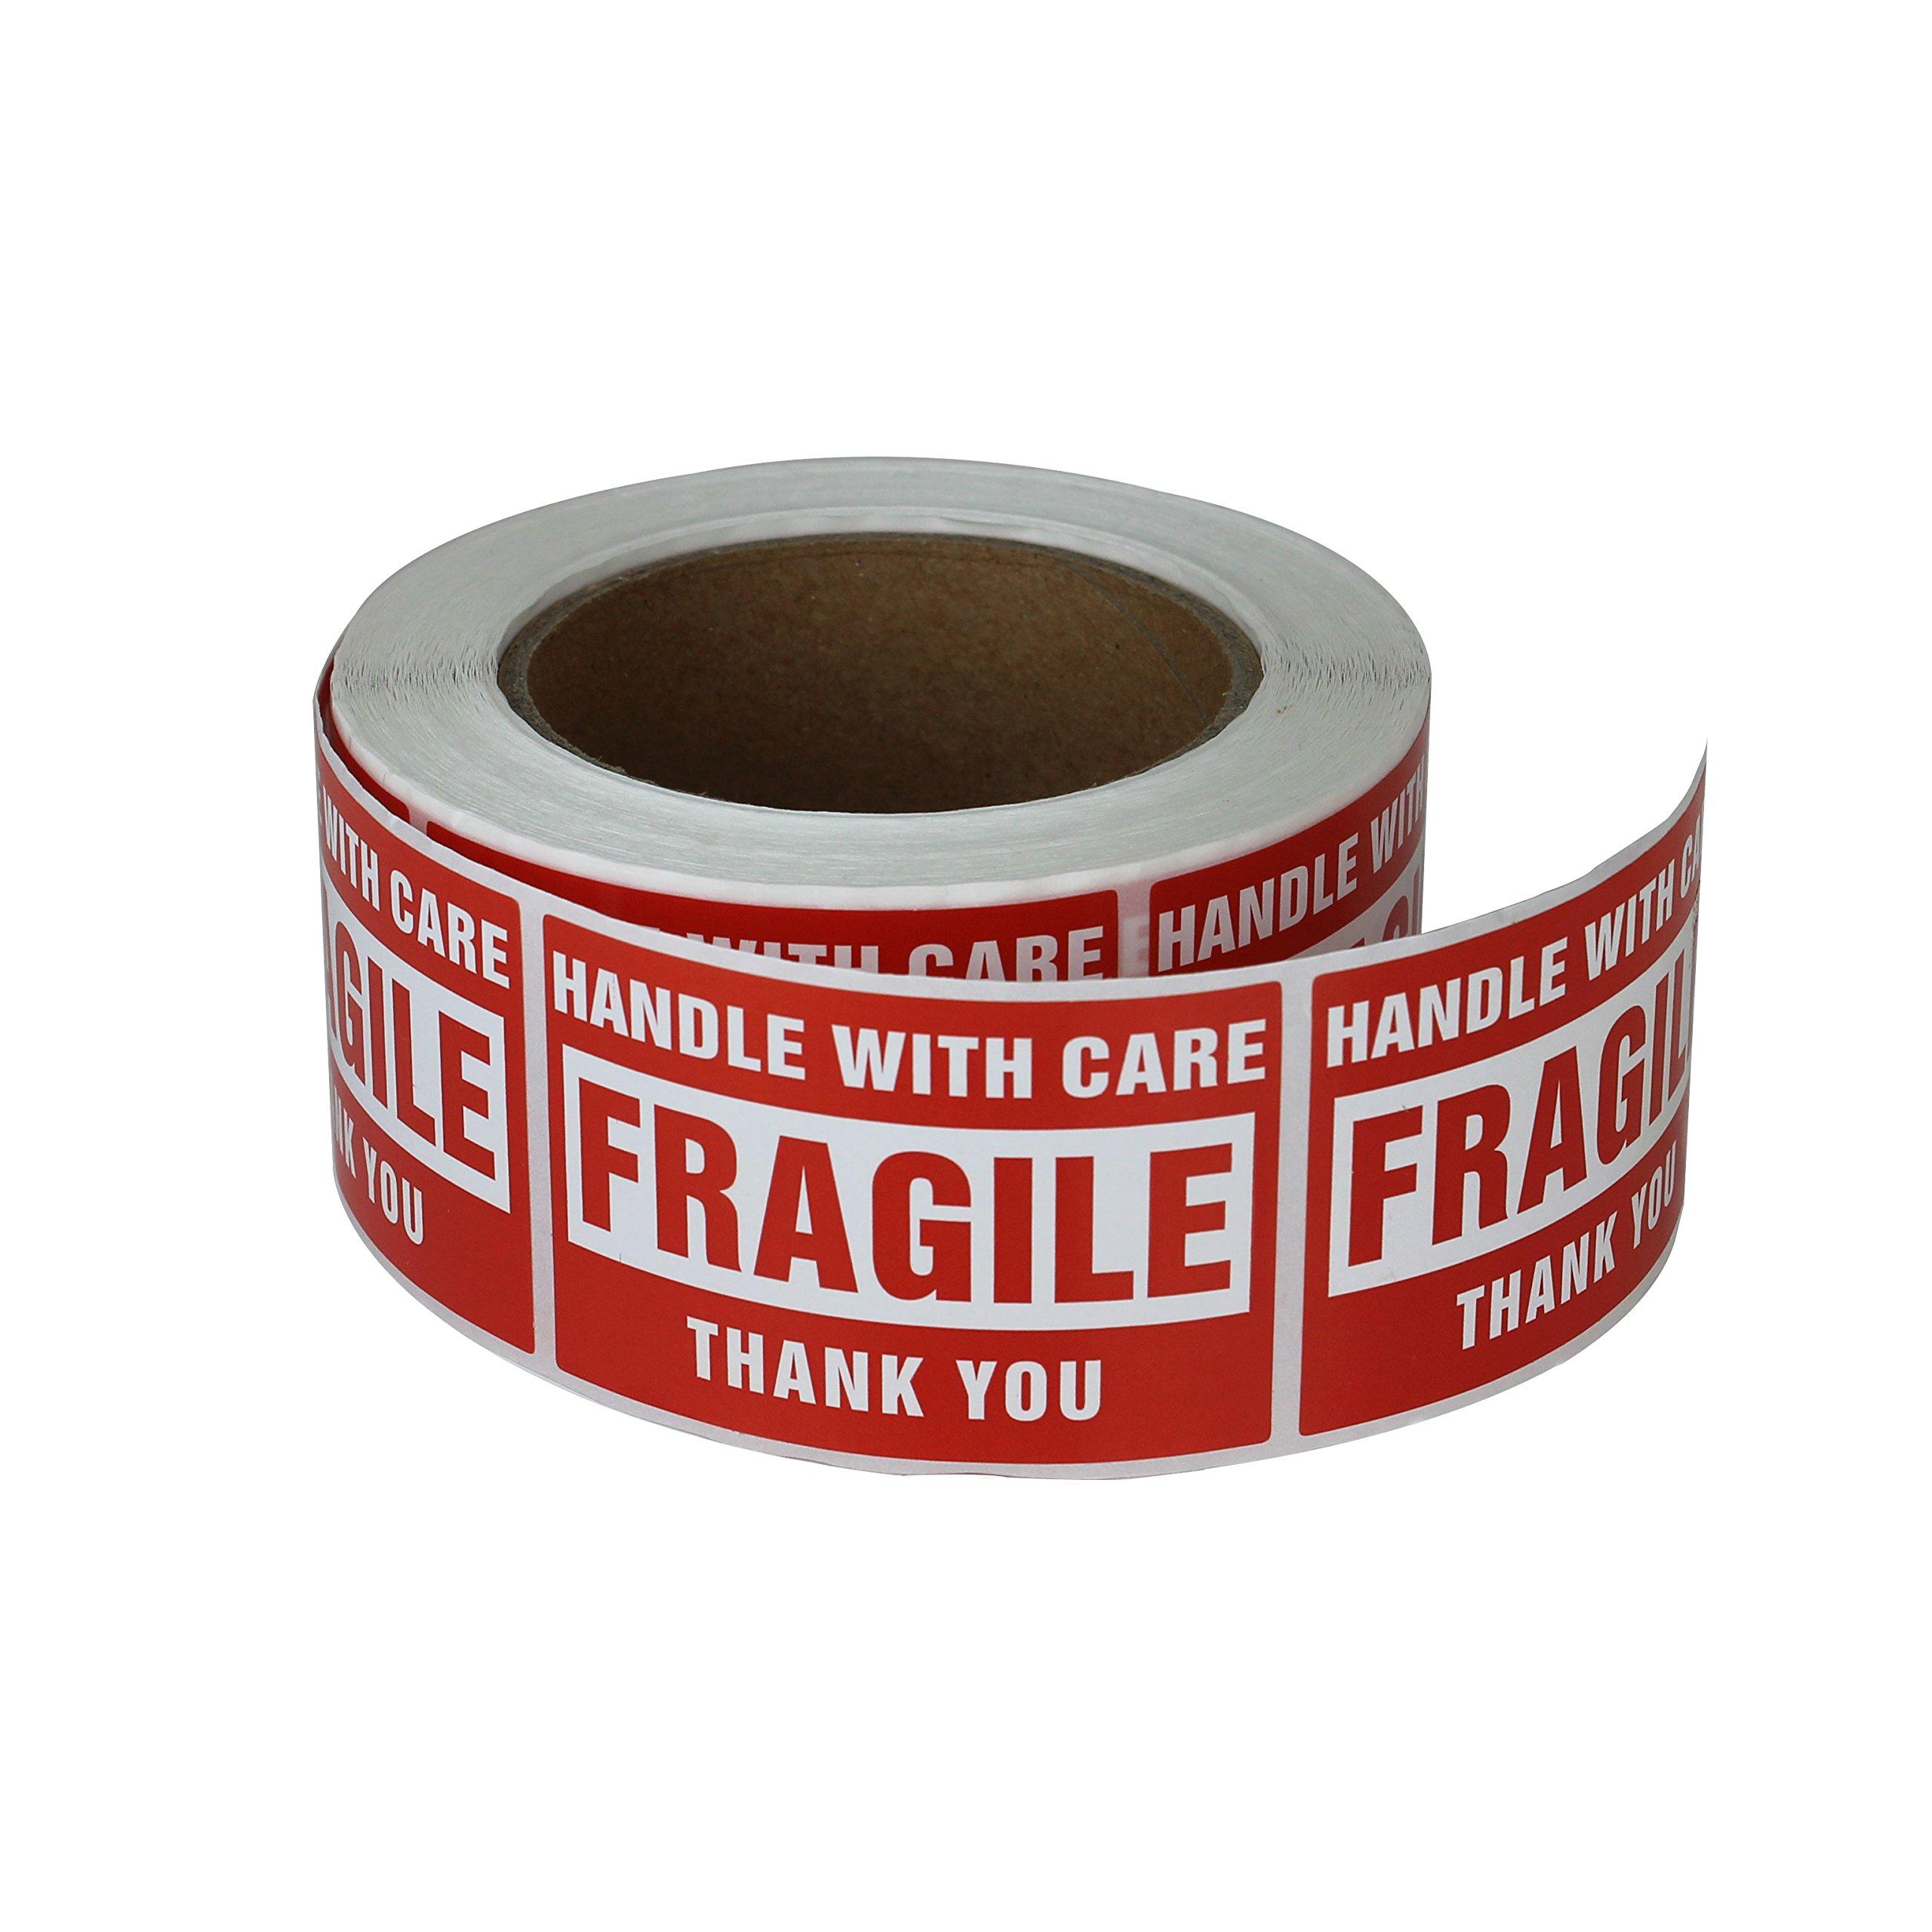 fragile label fragile labels uk fragile label usps